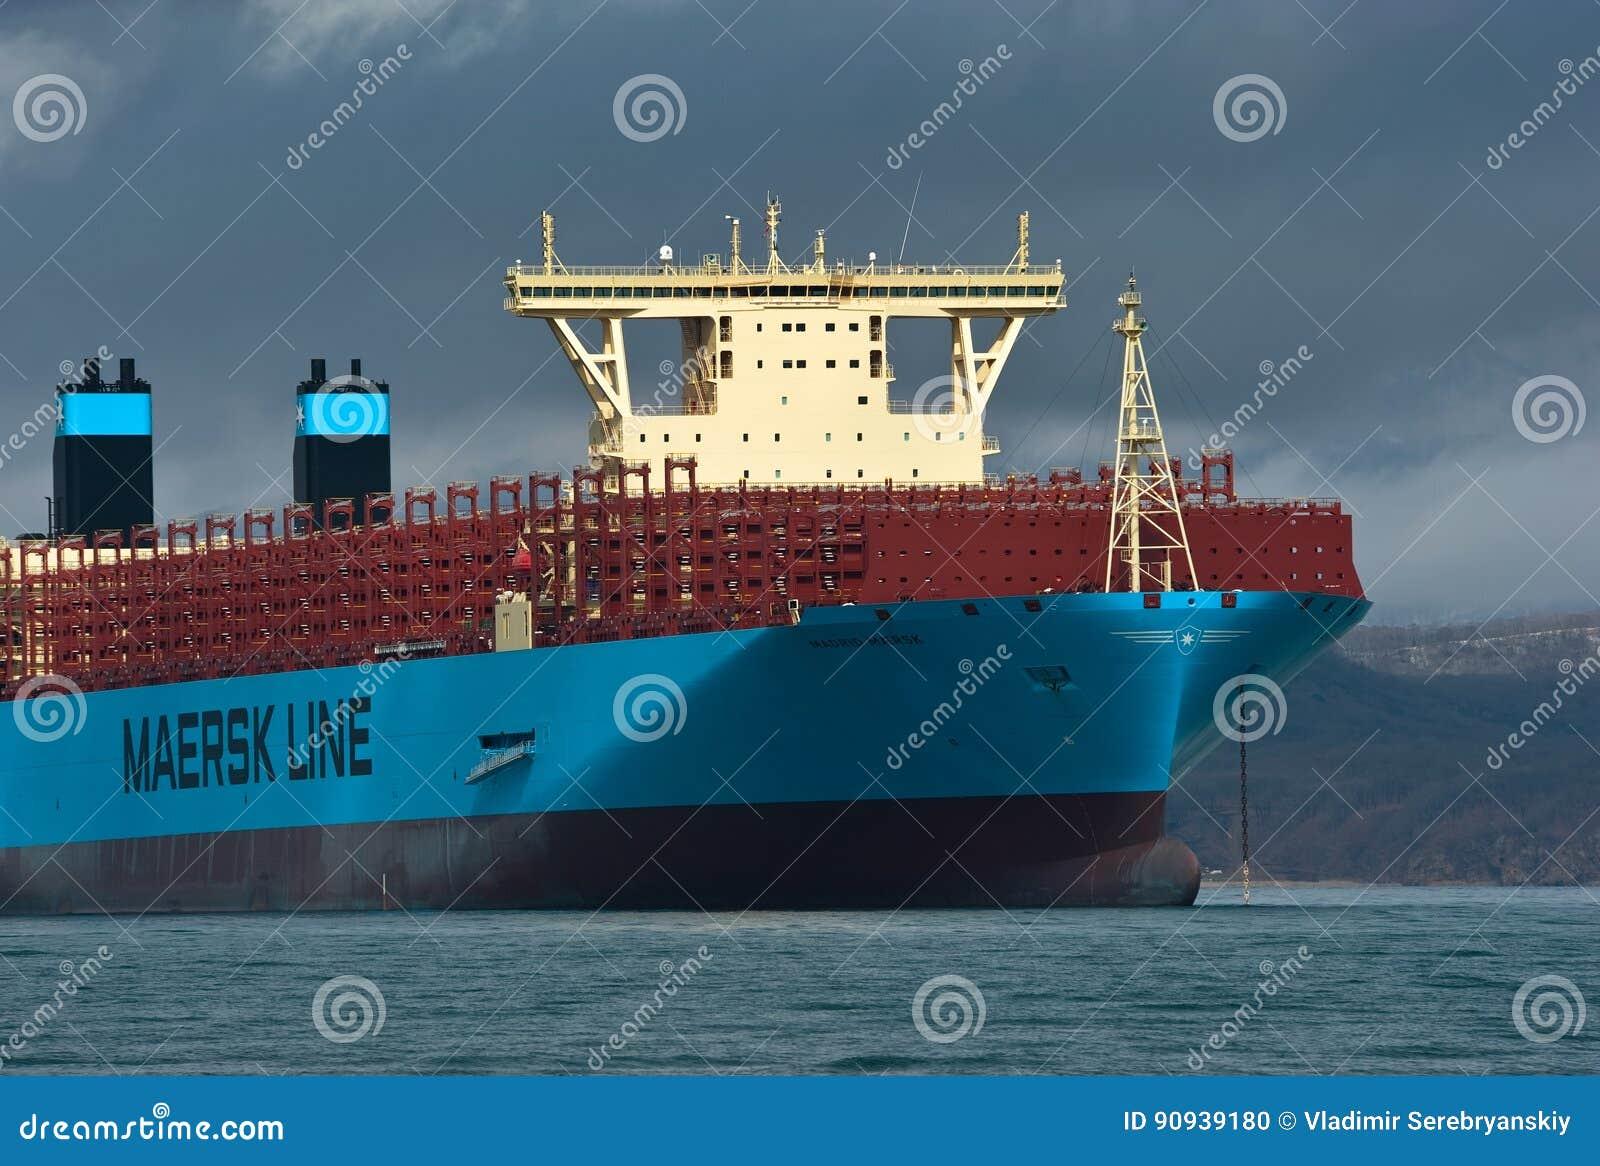 Nakhodka, Russia- April 19, 2017: Container Ship Madrid